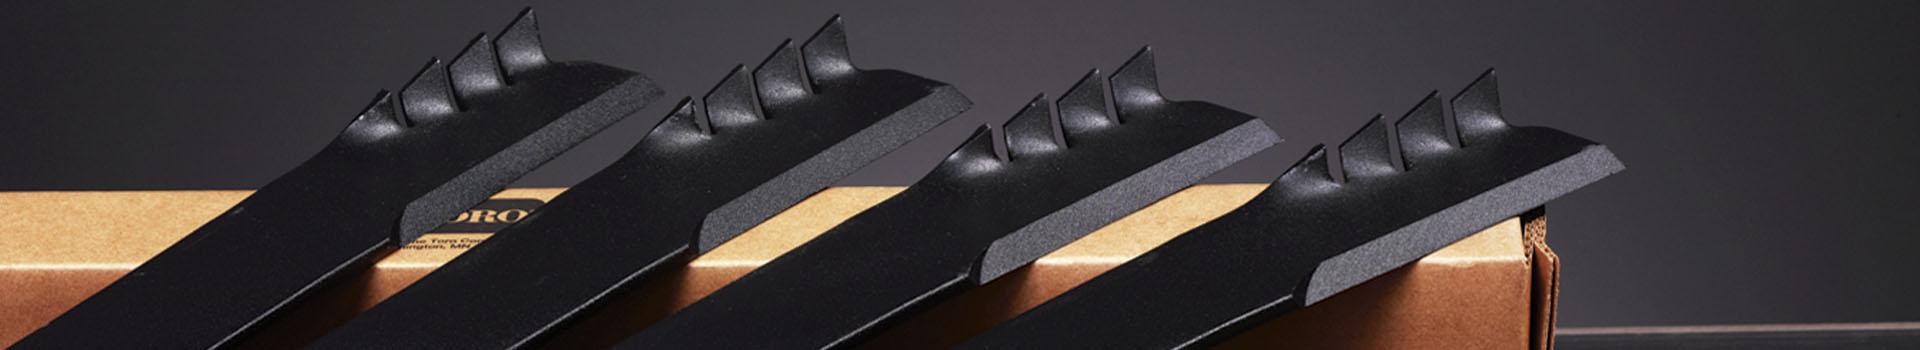 Eksklusivt-tilbud-spar-15%-på-originale-Toro-rotorknive-2